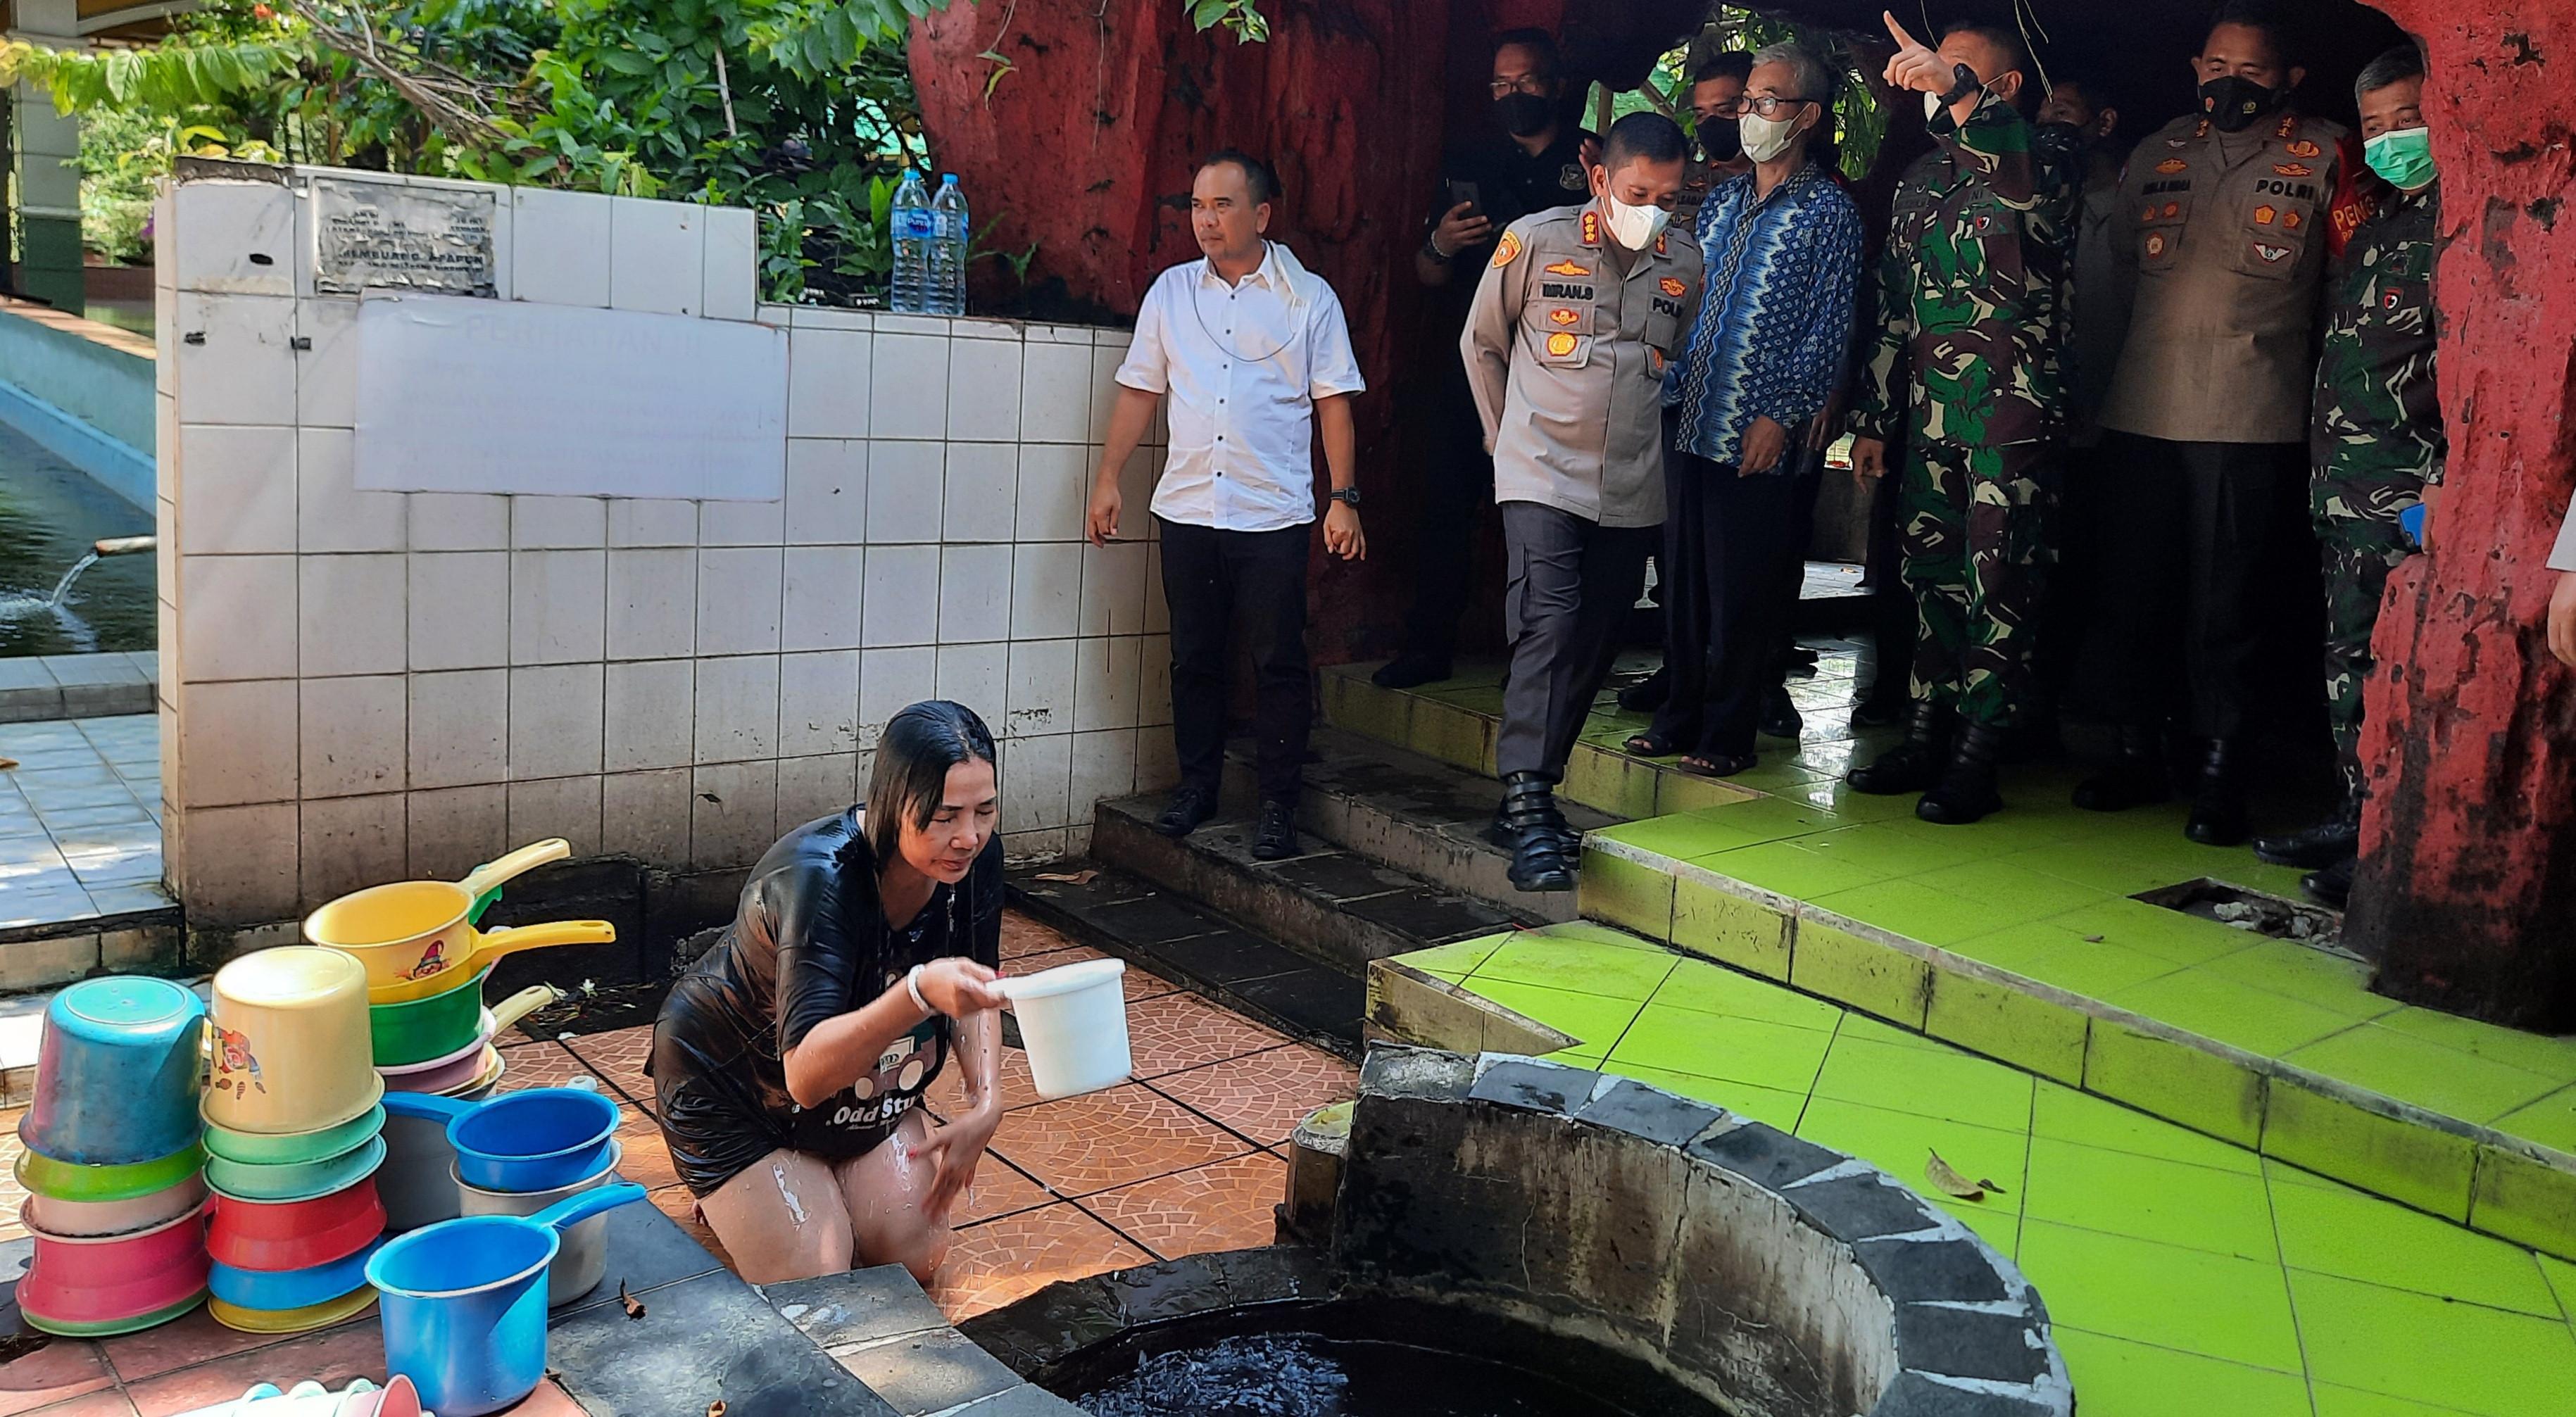 7 Sumur di Wihara Gayatri yang Dipercaya Warga Depok Membawa Keberkahan - JPNN.com